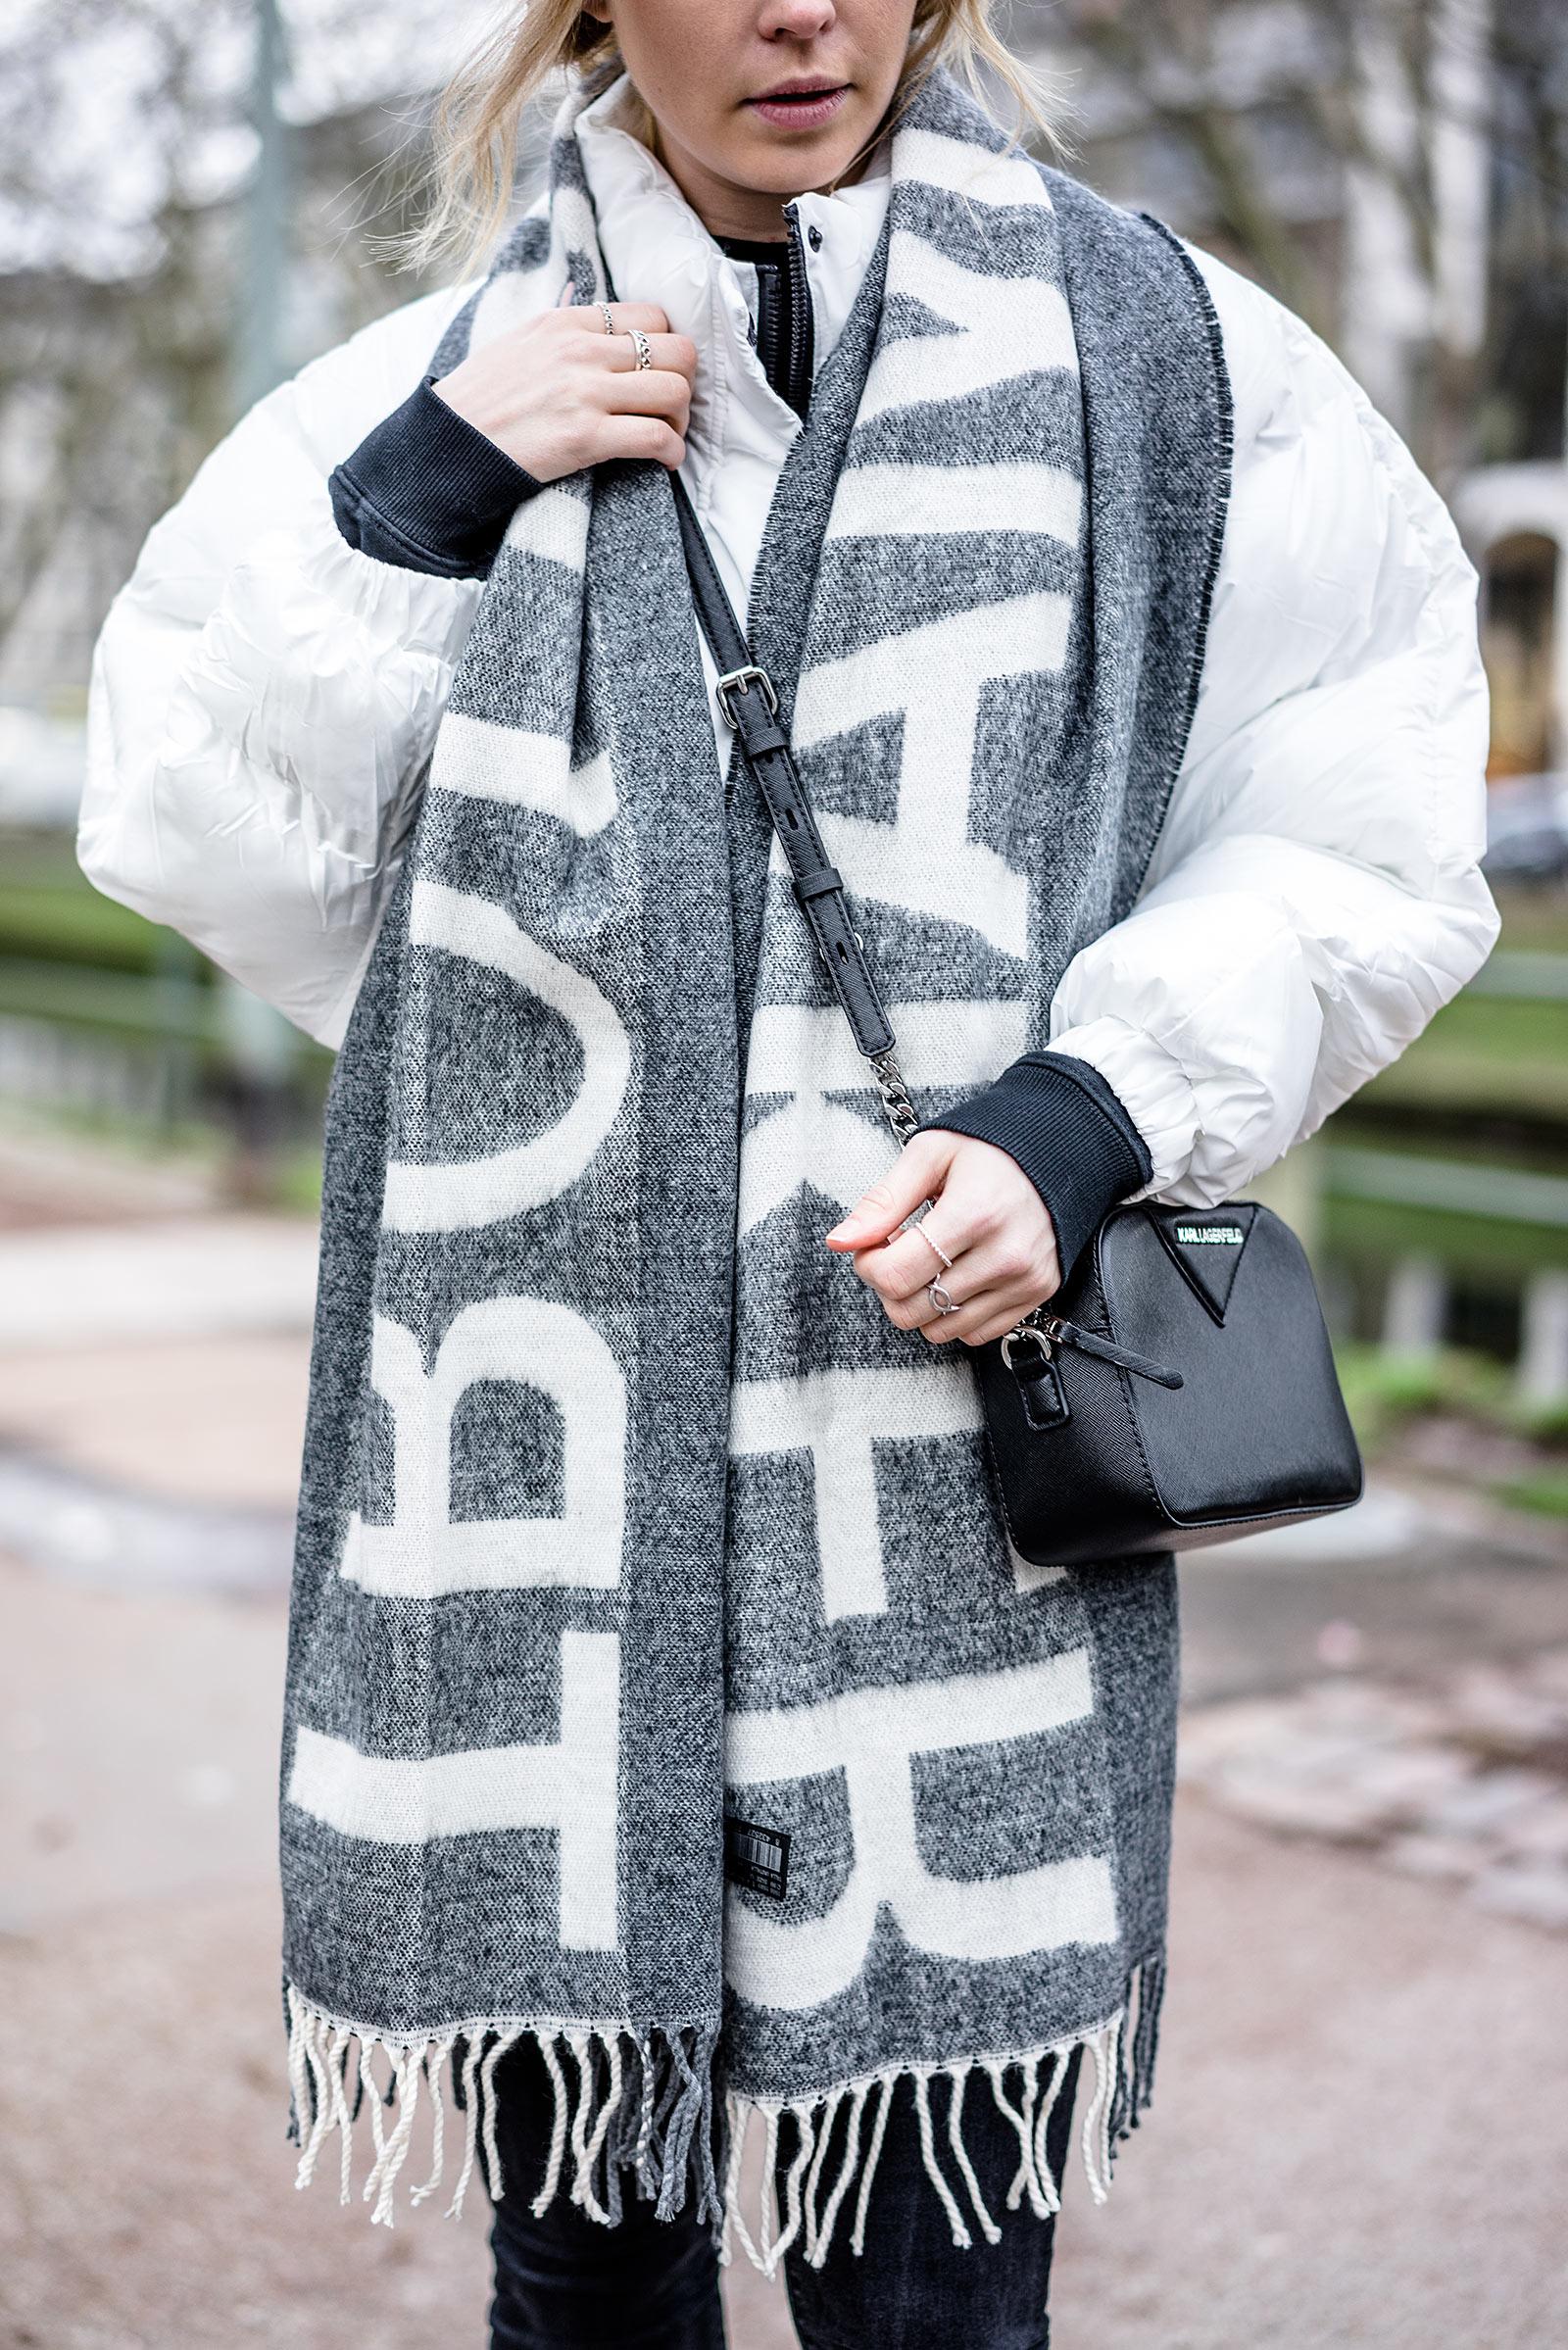 Statement Schal Mango Outfit Fashion Blogger Sunnyinga